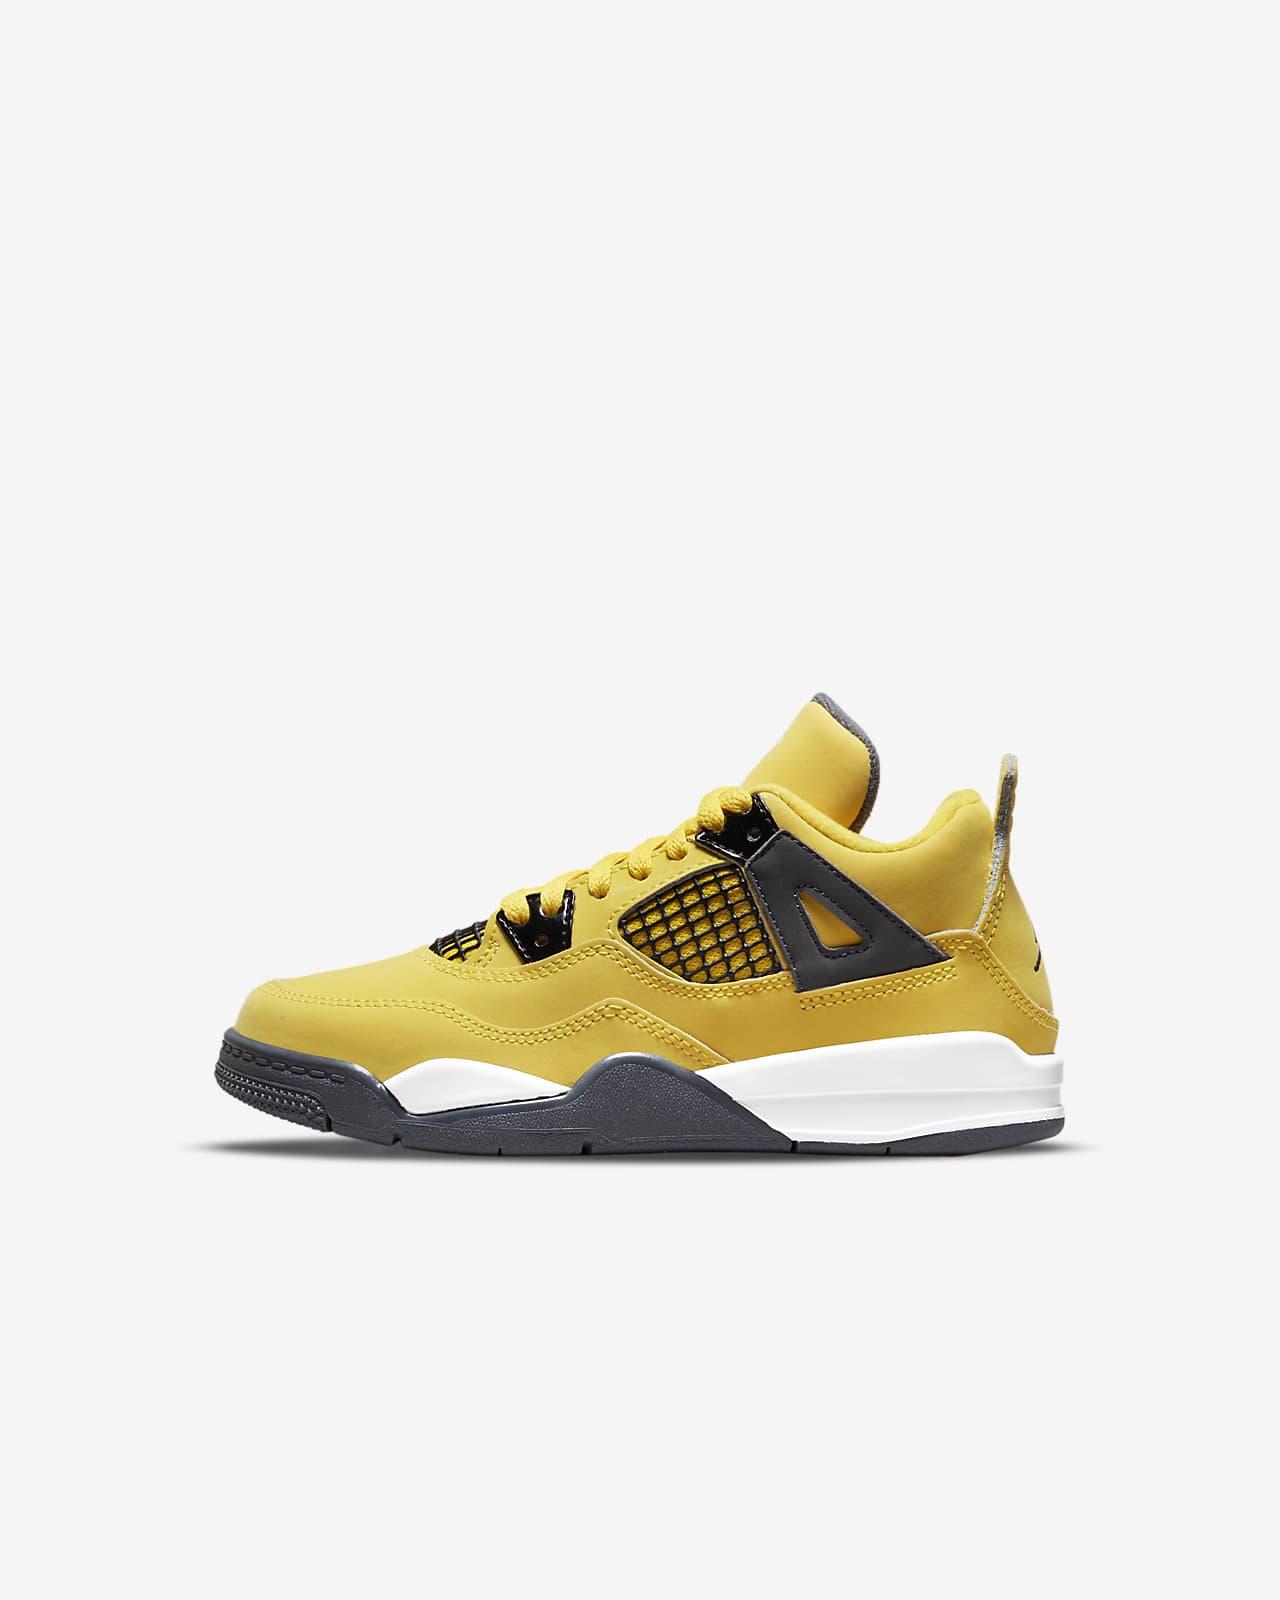 Jordan 4 Retro Little Kids' Shoes